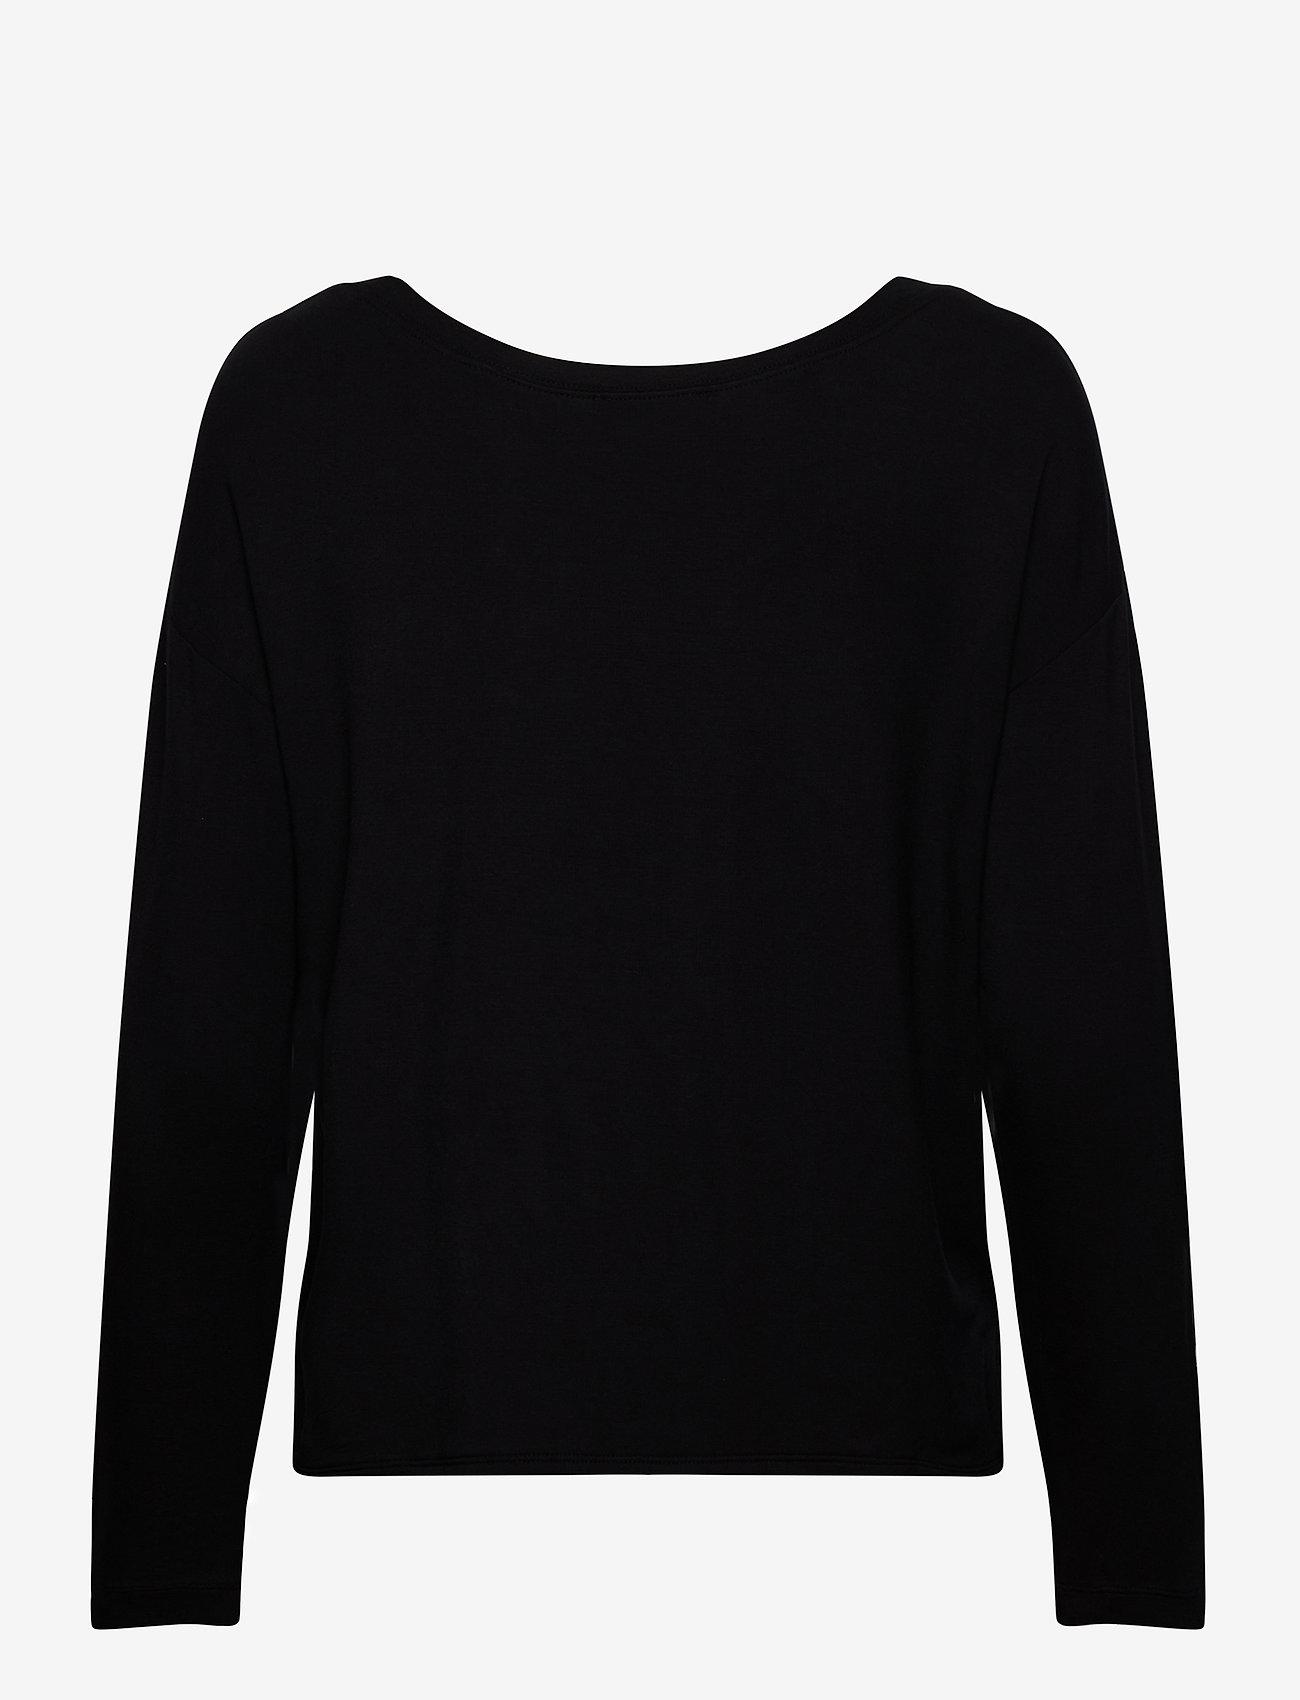 Marc O'Polo - SWEATSHIRTS - sweatshirts - black - 1